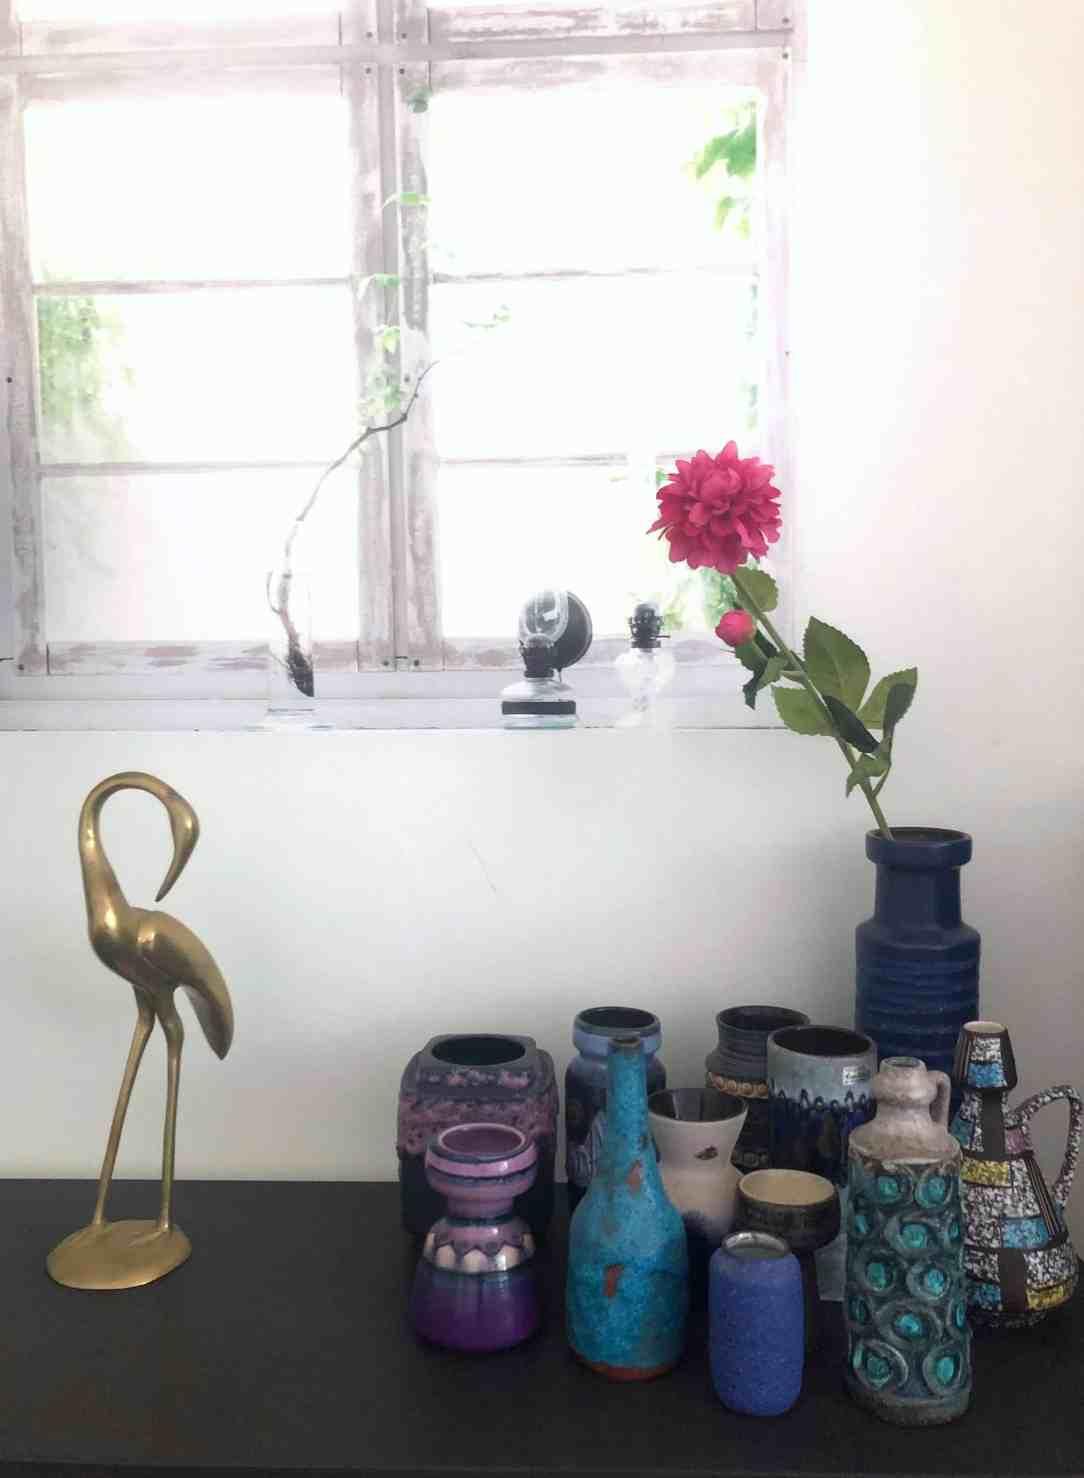 Fake bloem- vintage vazen